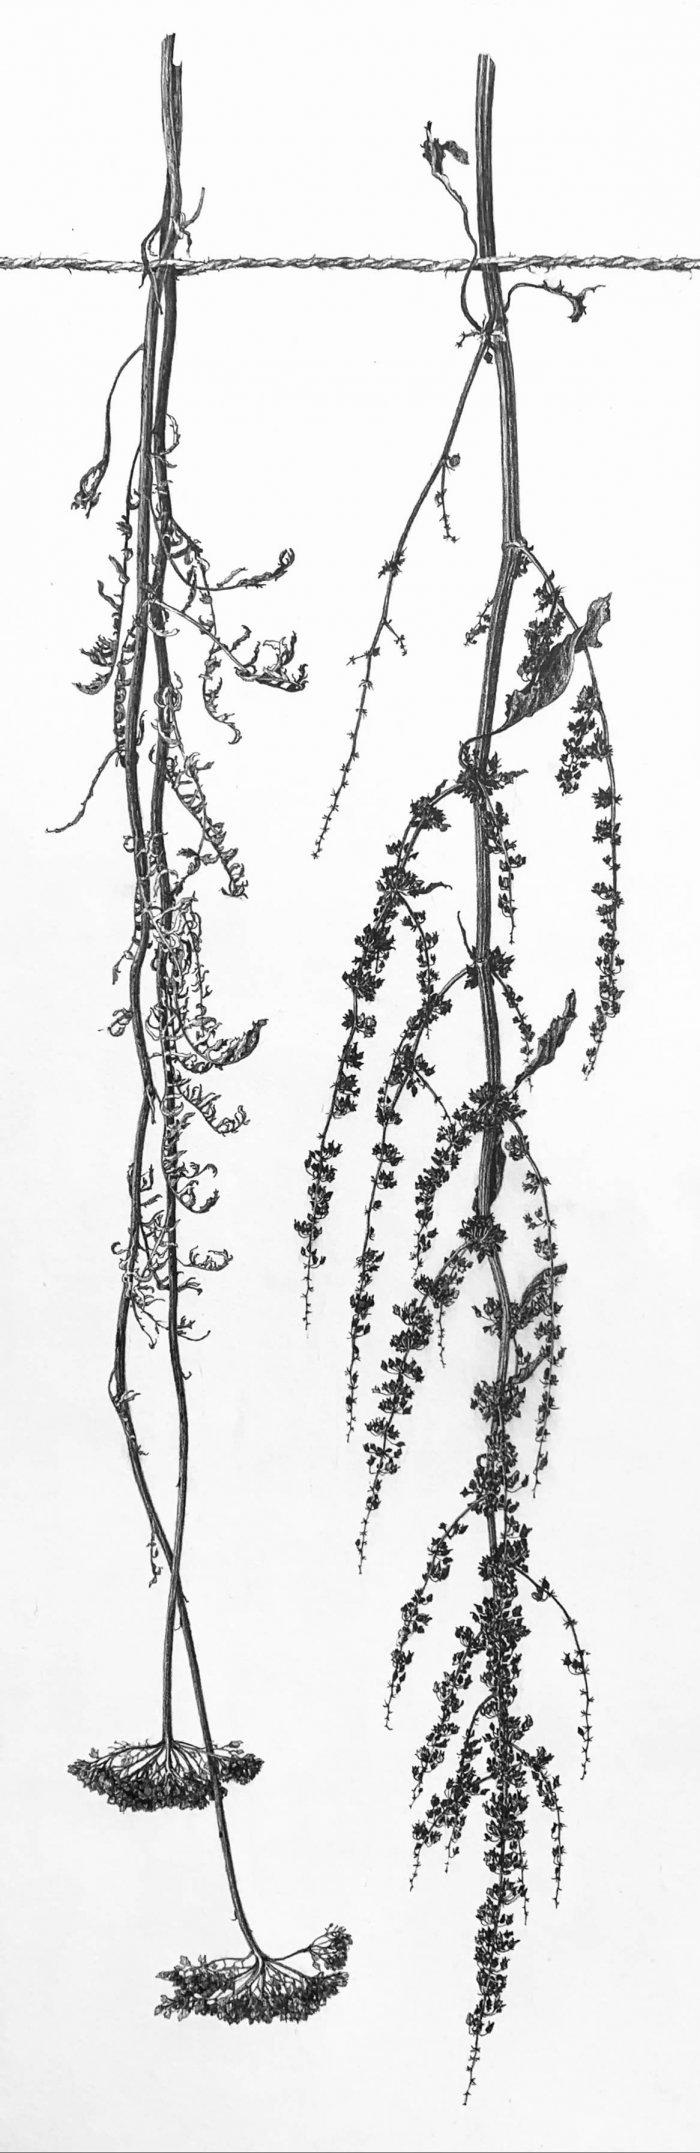 Jane-Wolsak-Yarrow-And-Dock-2019-Graphite-On-Gessoed-Panel-24x8-550-Online-Art-Galleries